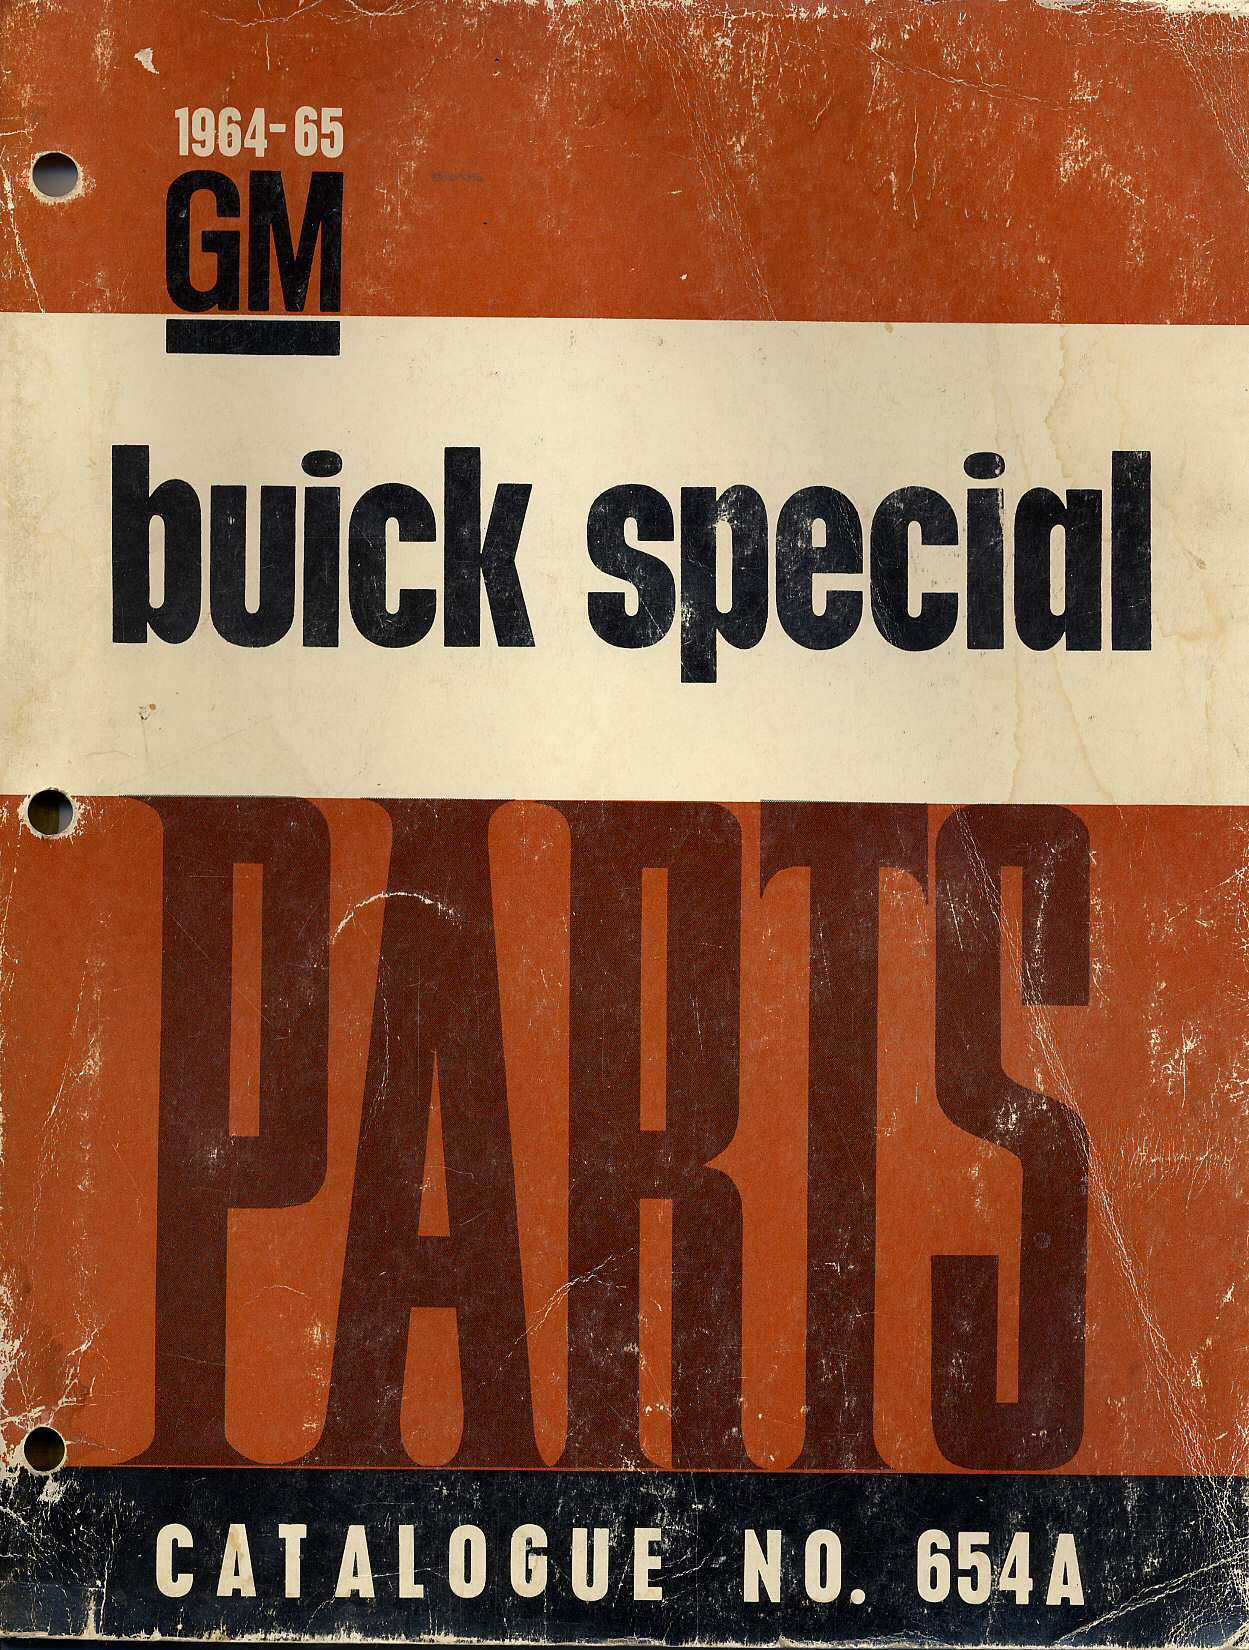 1964-65 Buick Special Master Parts Catalog